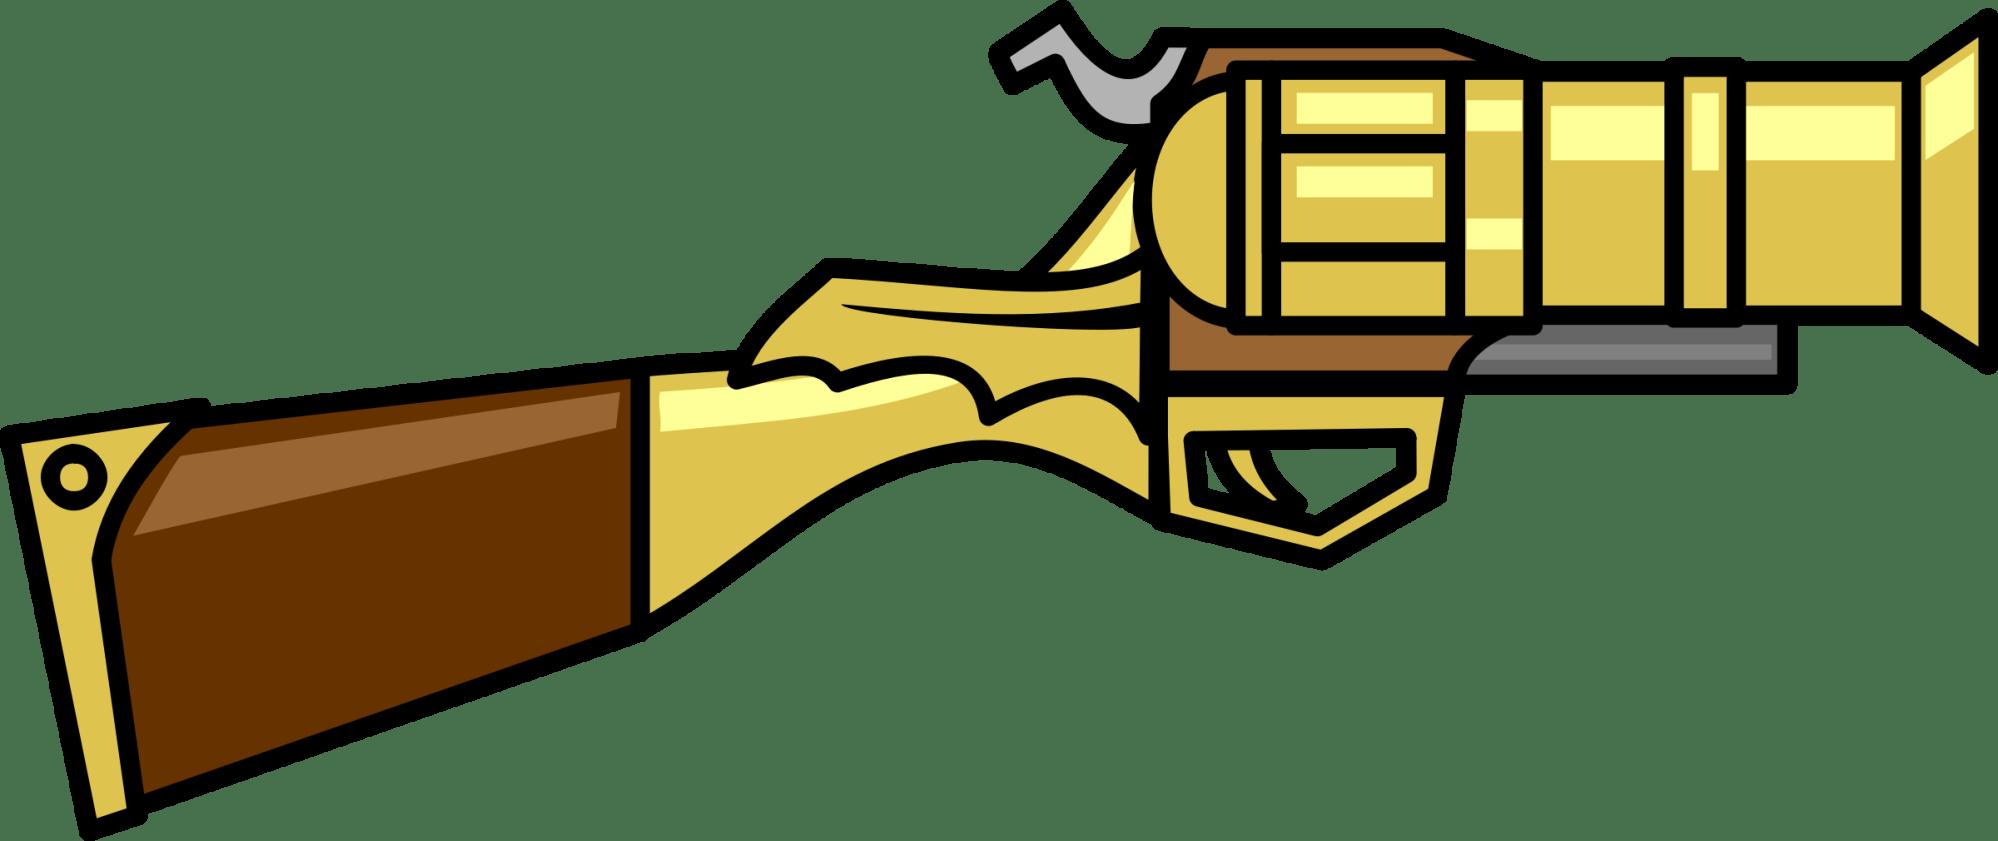 hight resolution of free photos vector images cartoon gun vector clipart